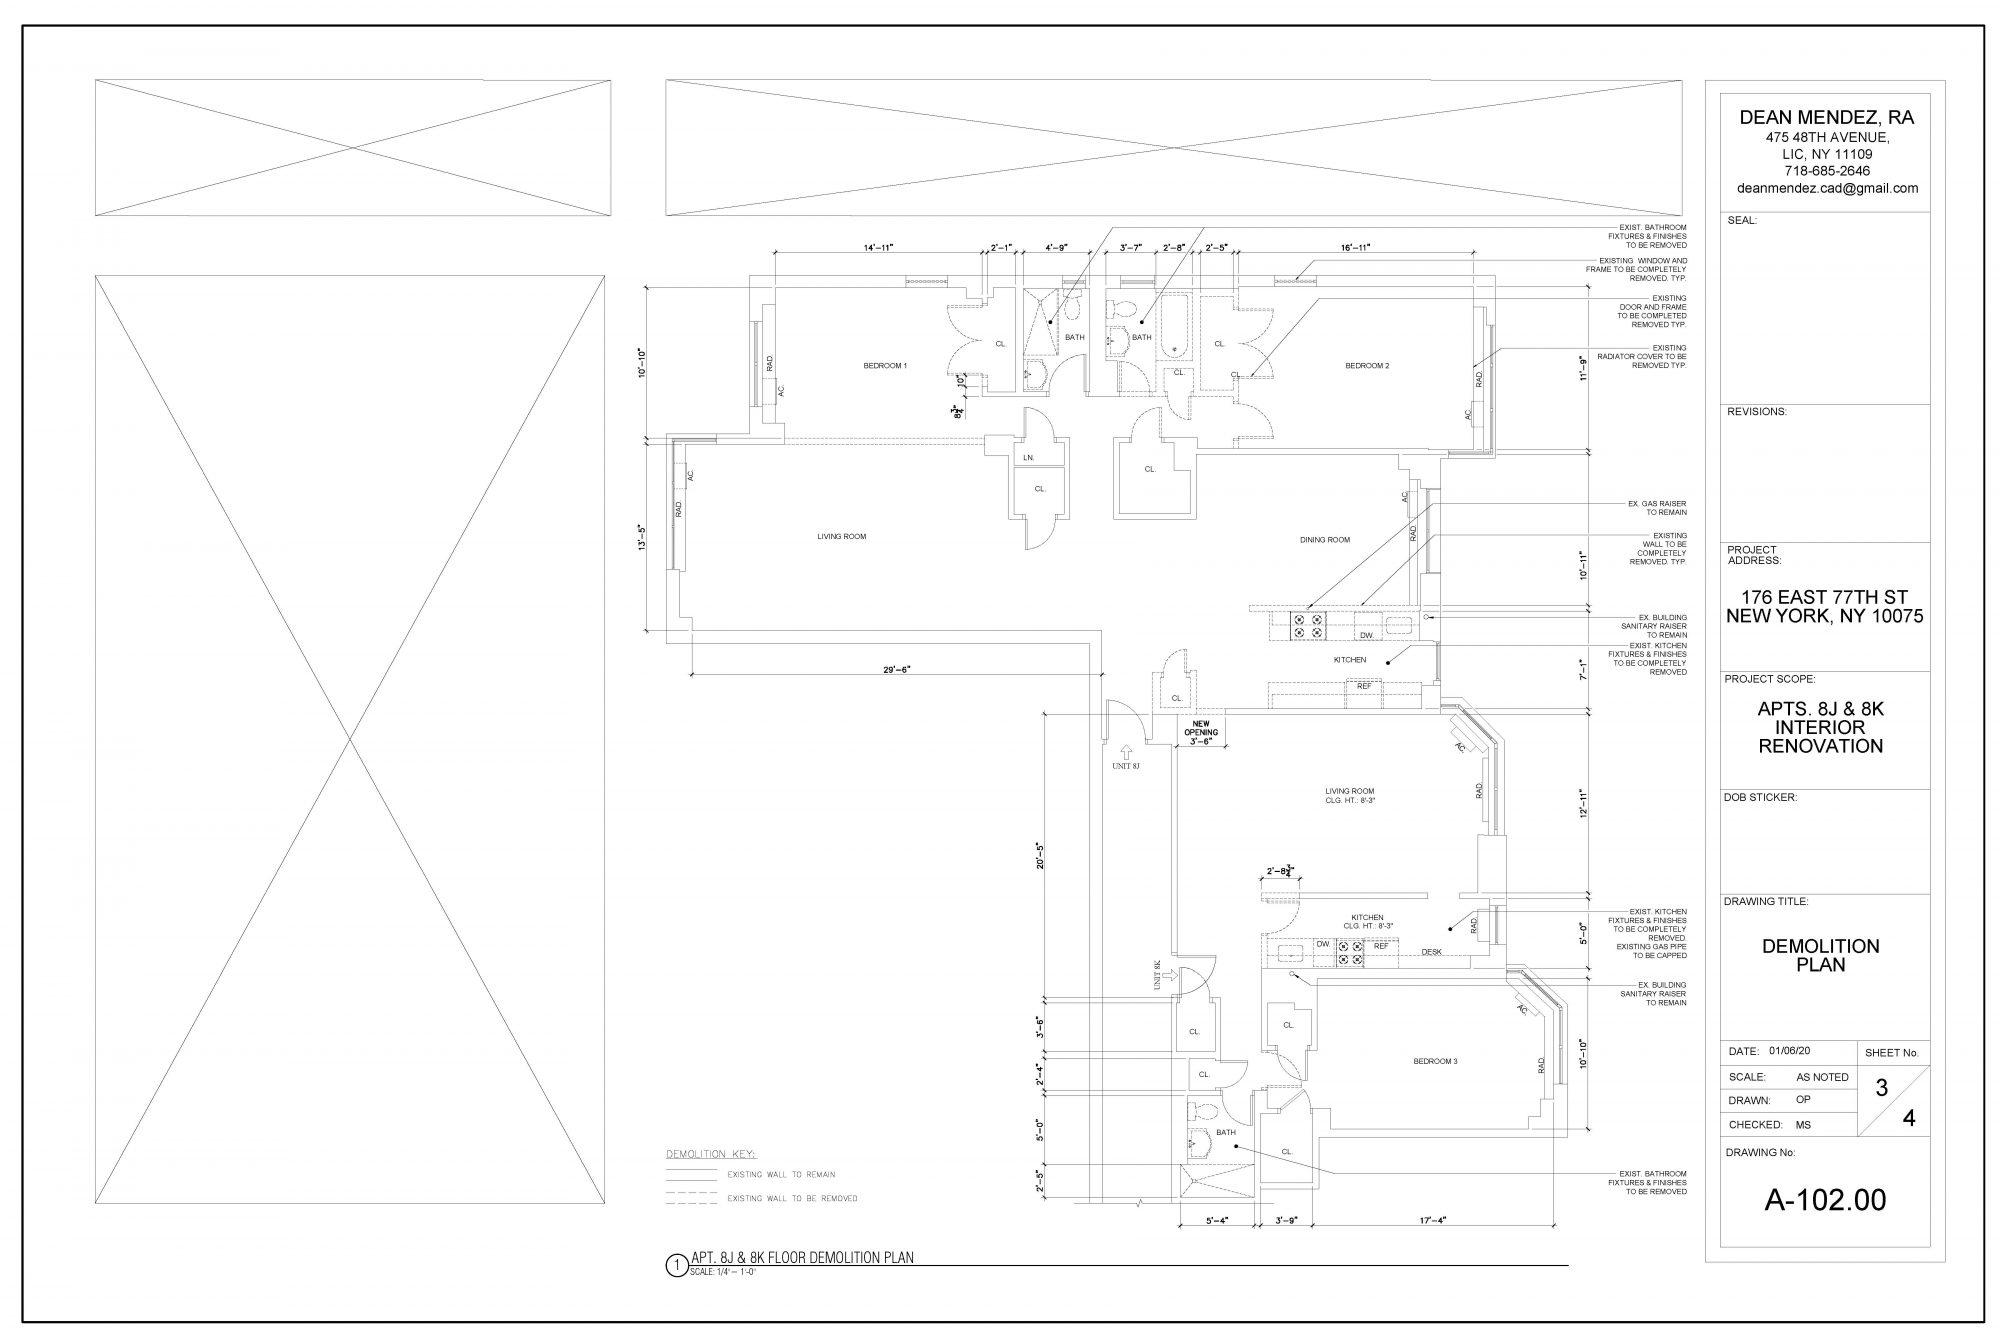 New York Apartment Interior Renovation Construction Drawing